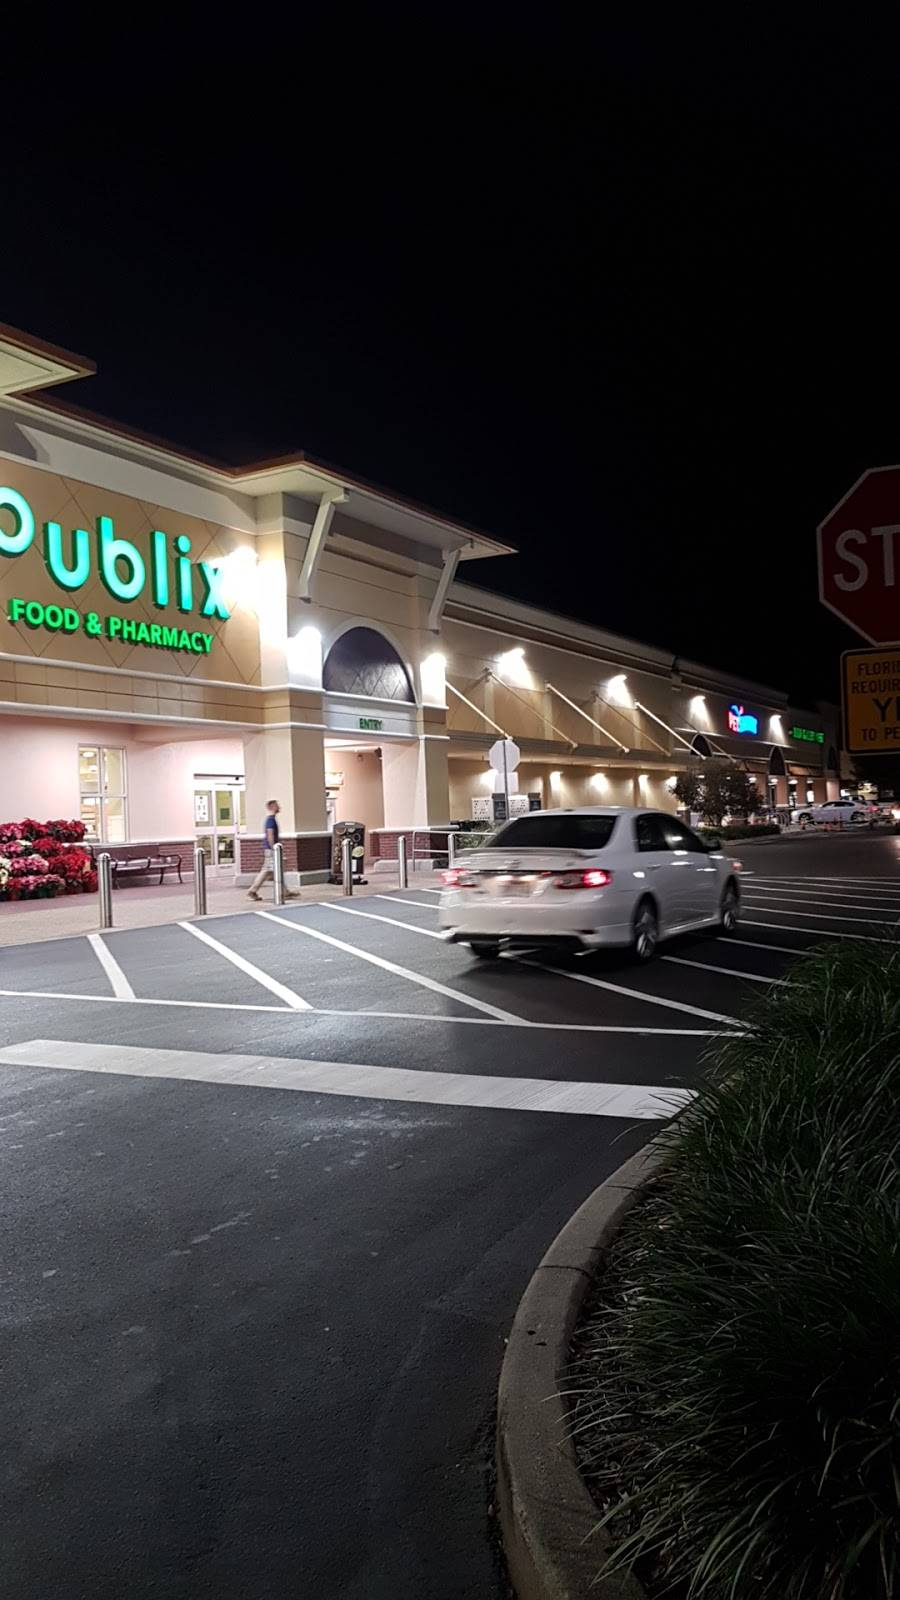 Millhopper Shopping Center   shopping mall   4111-4121 NW 16th Blvd, Gainesville, FL 32605, USA   8136644800 OR +1 813-664-4800